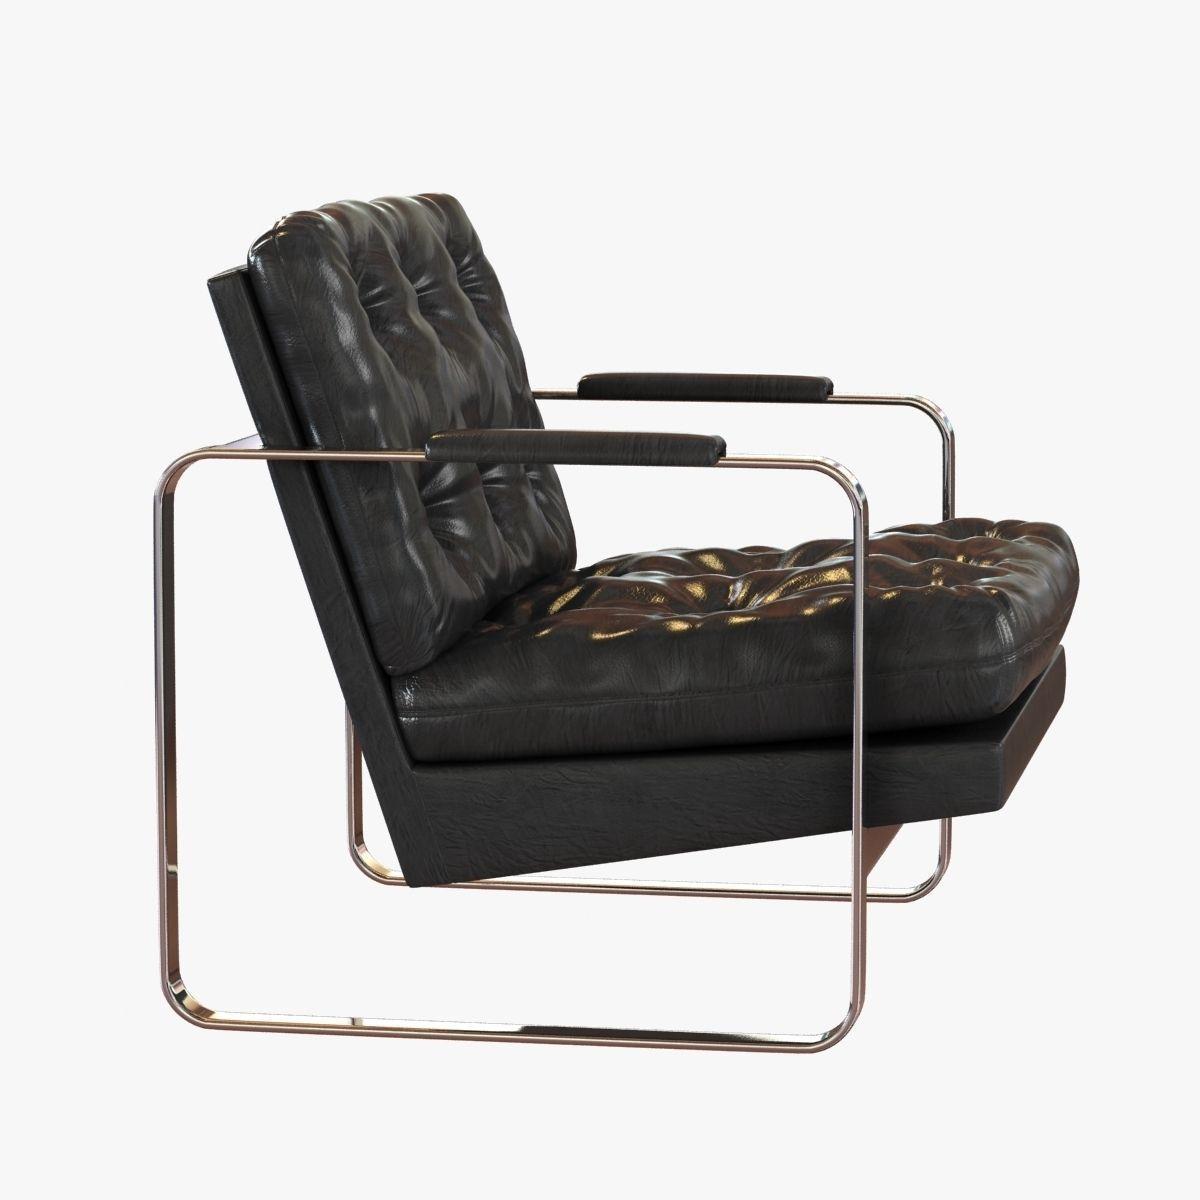 ... Milo Baughman For Thayer Coggin Lounge Chairs 3d Model Max Obj 3ds Fbx  Mtl Unitypackage 3 ...